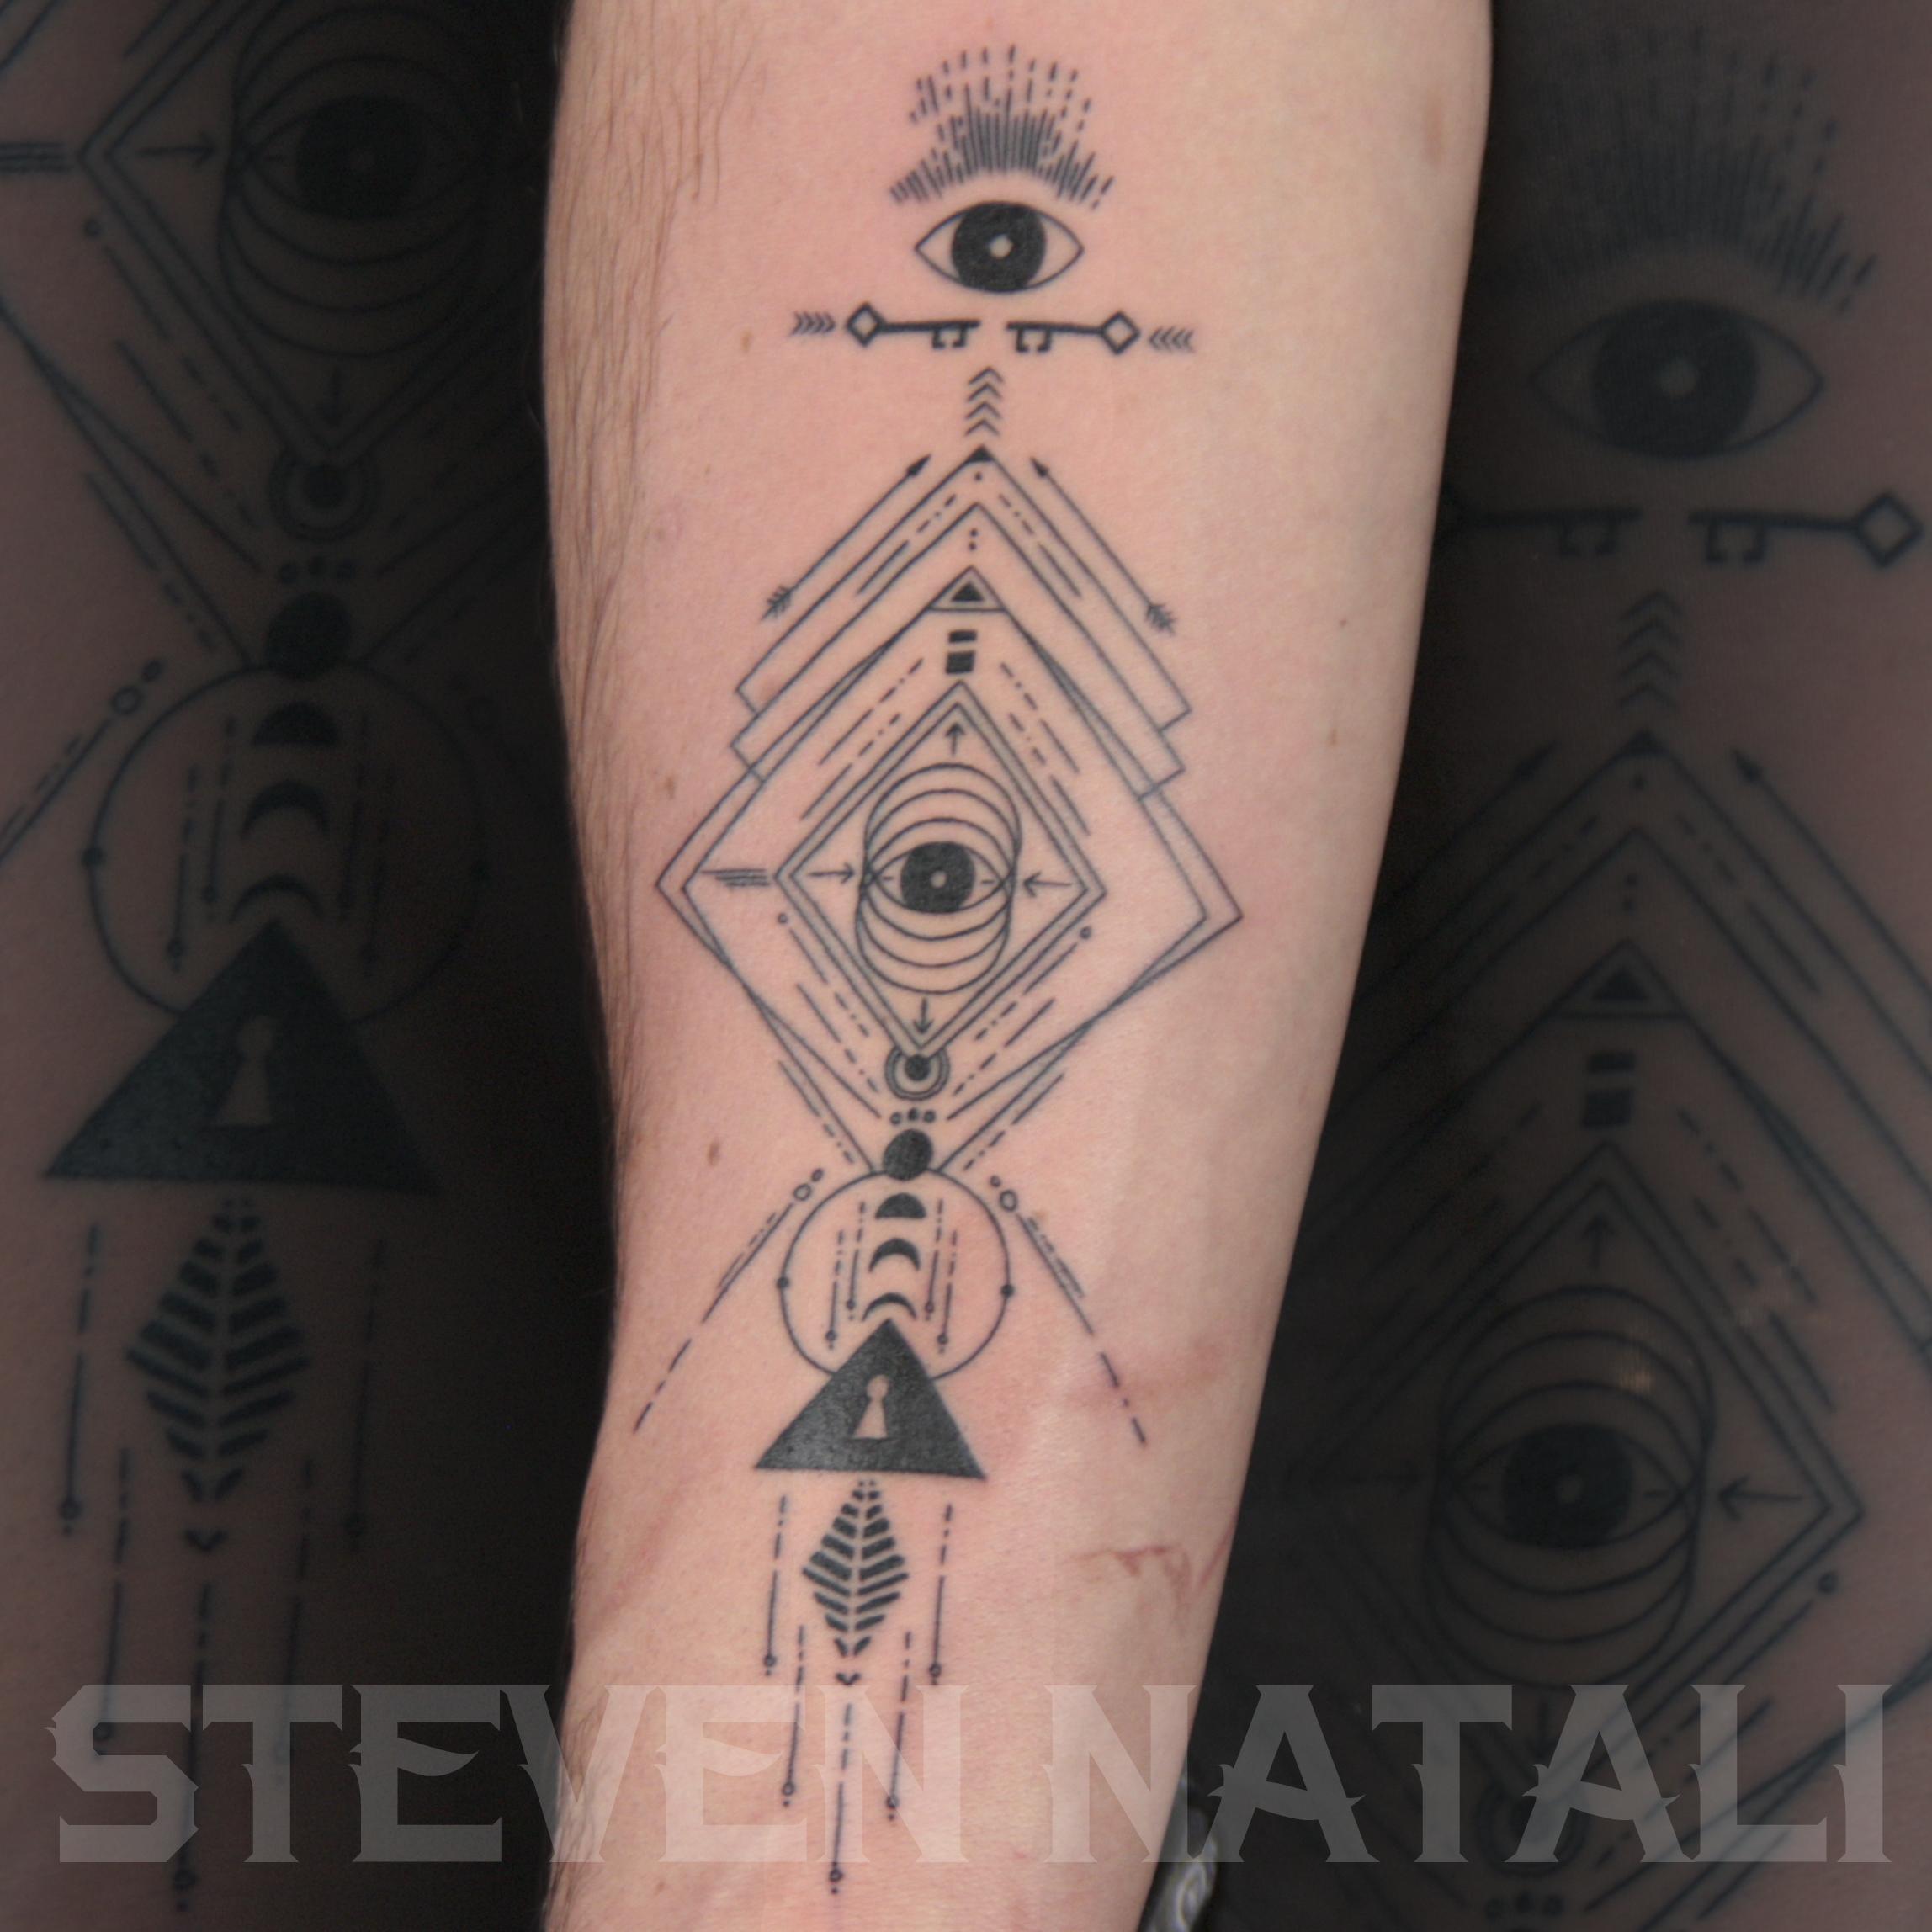 Tattooed by Steven Natali at Urban Element Tattoo. Denver, CO